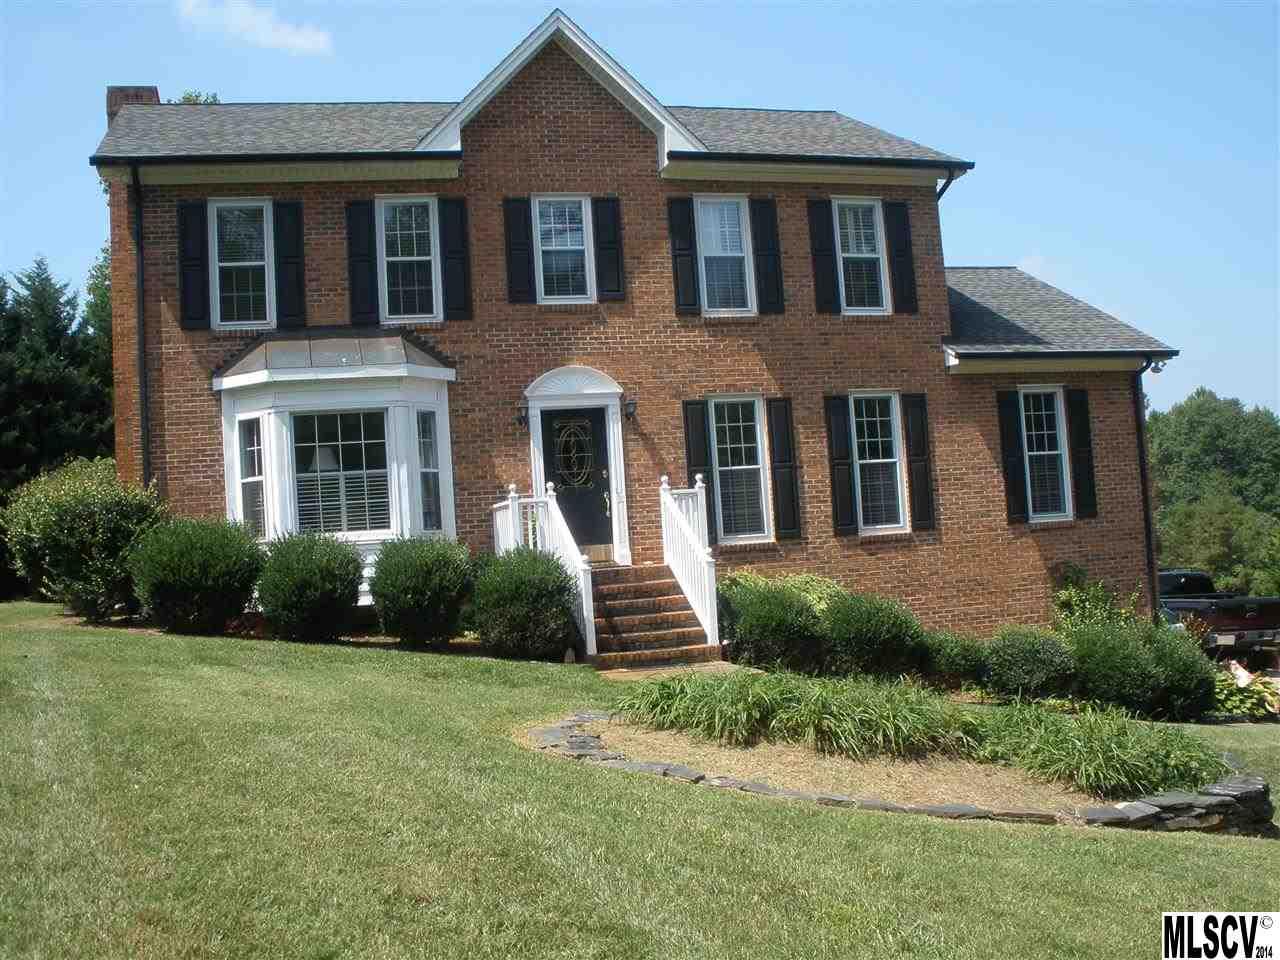 4133 Pinecrest Dr NE, Hickory, NC 28601